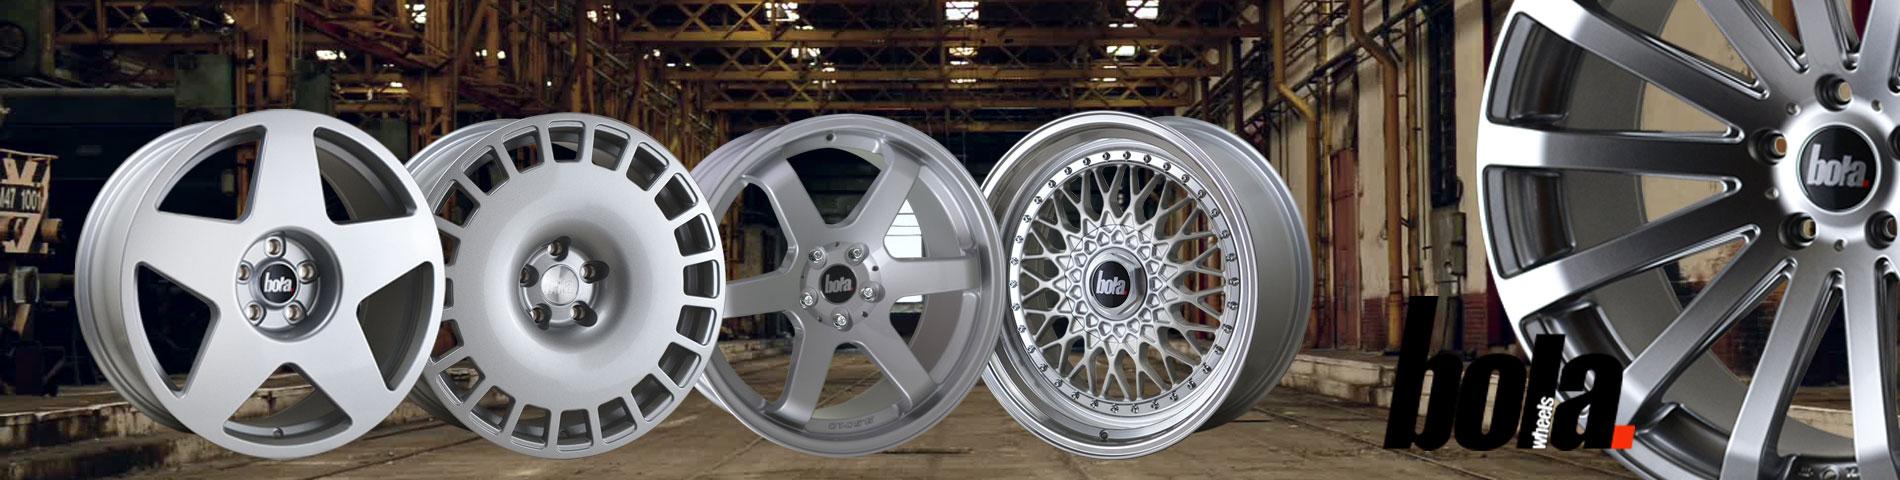 bola-wheels